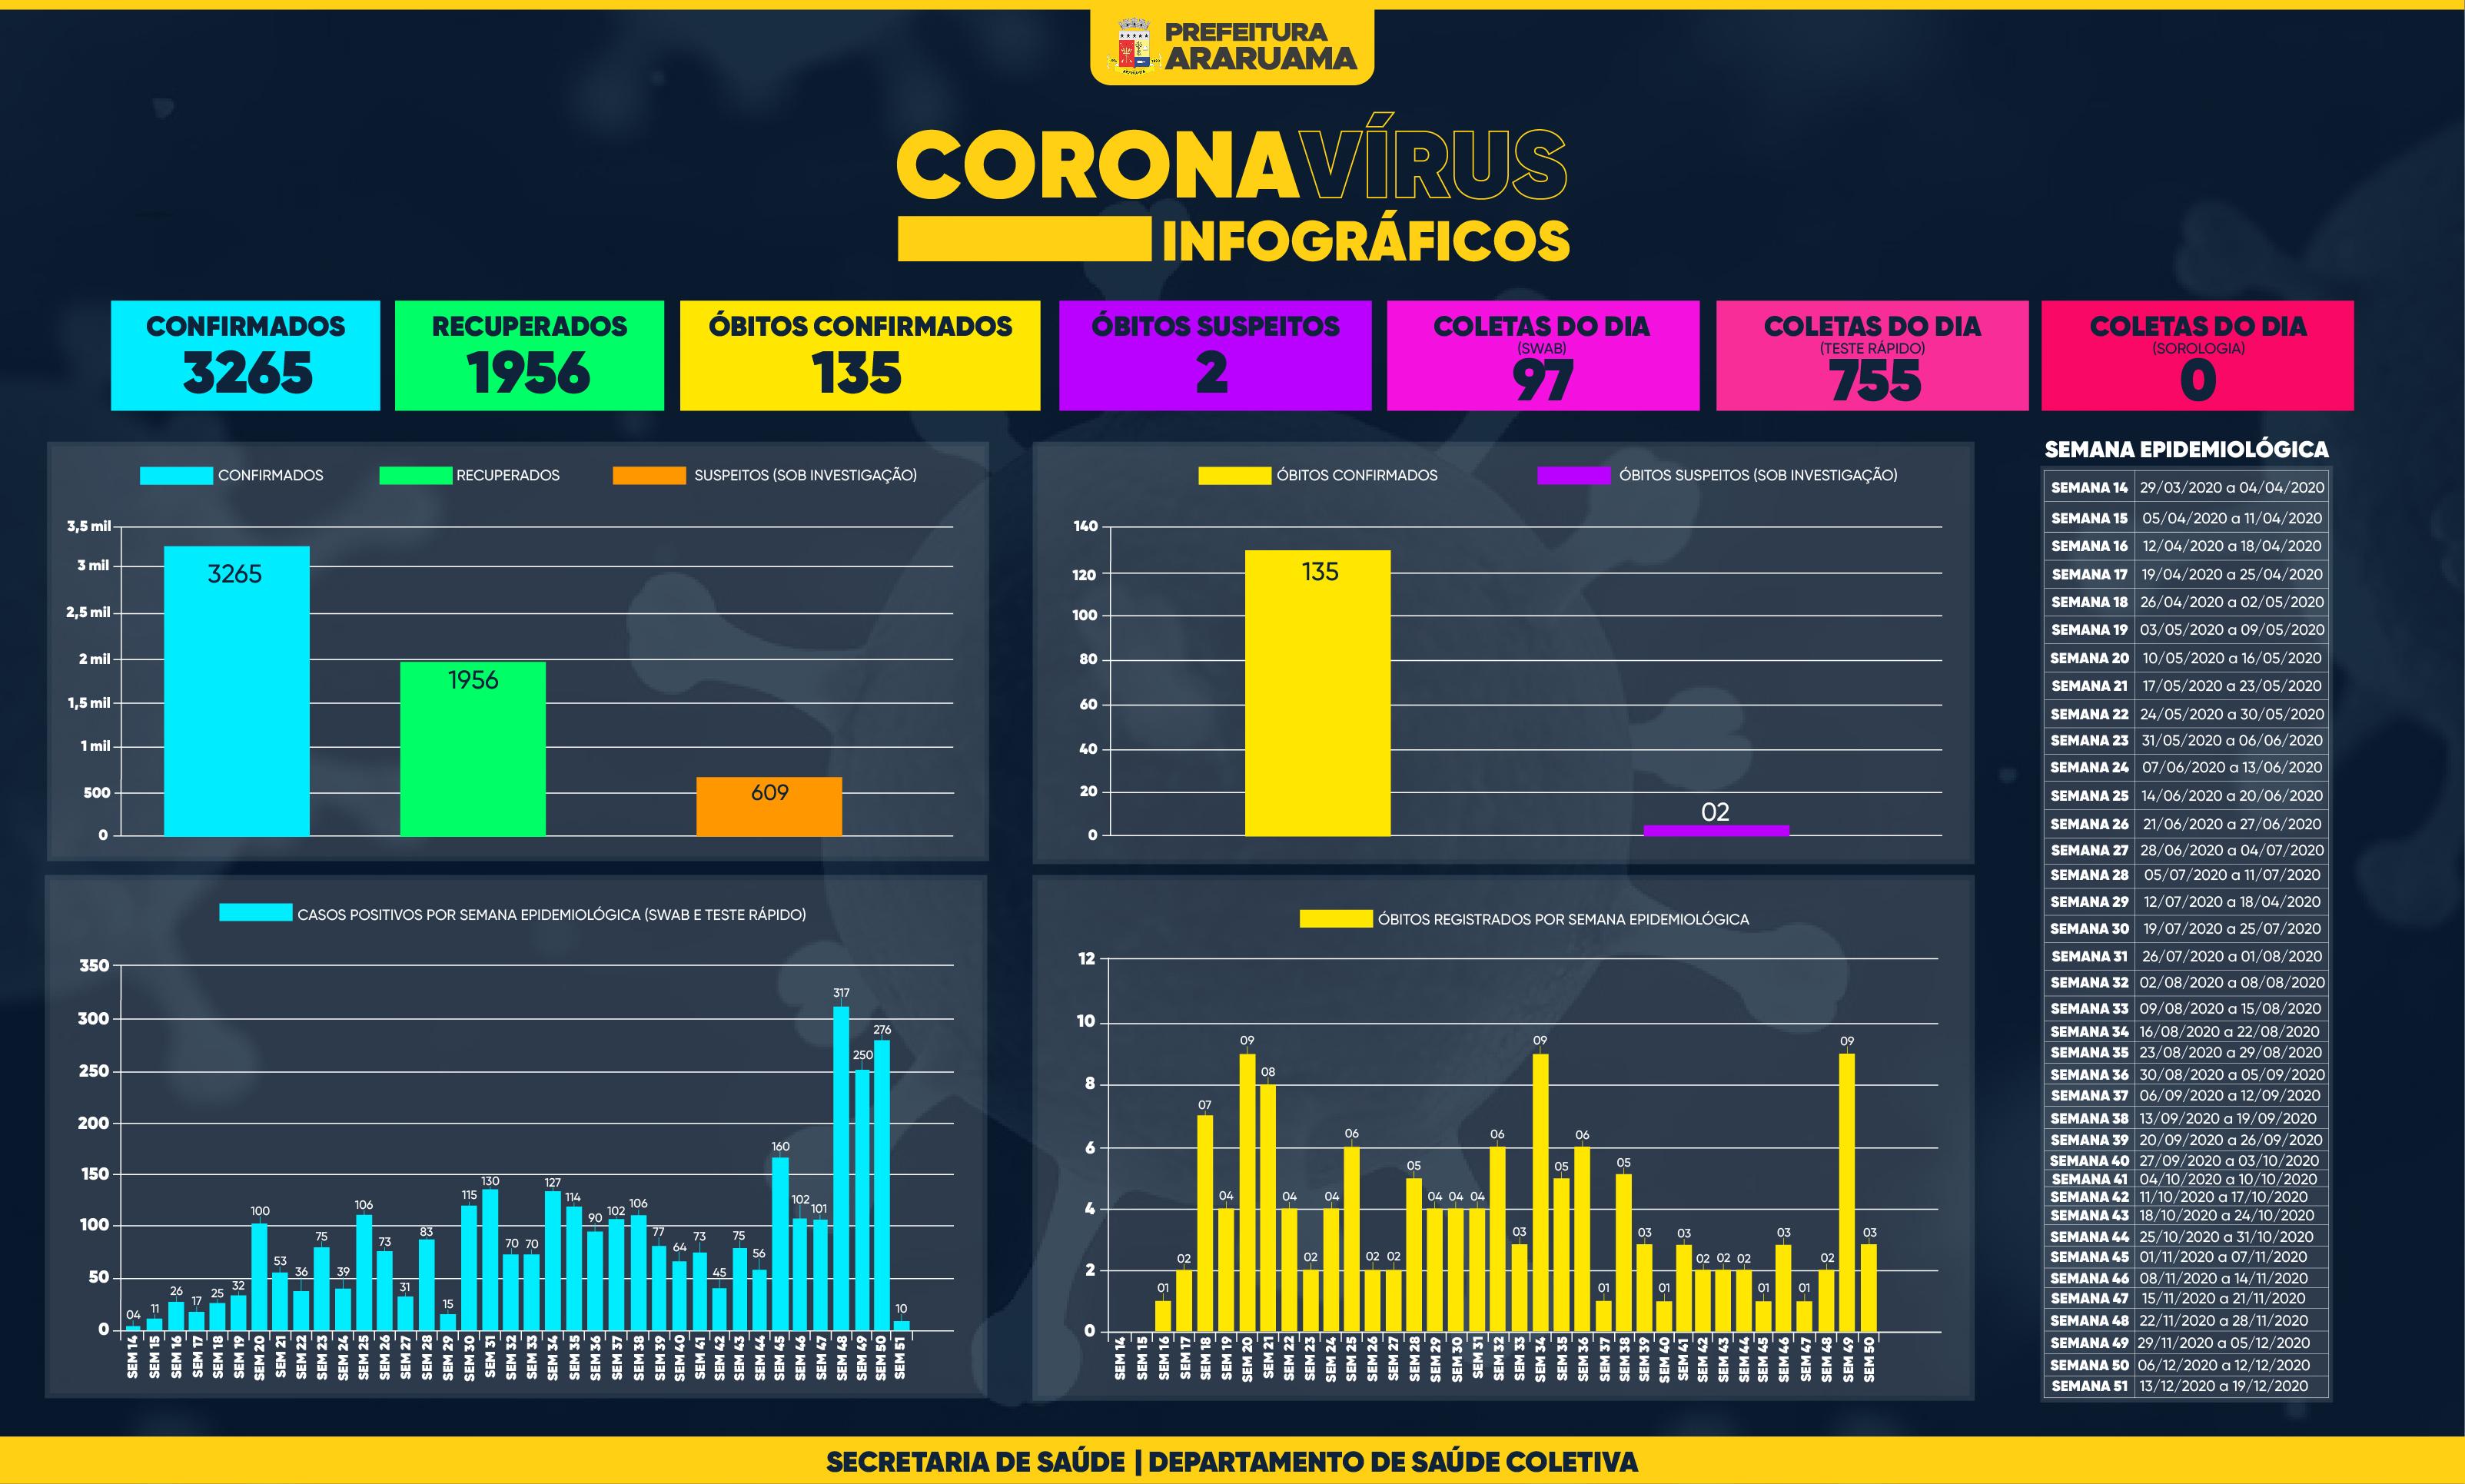 Painel de Monitoramento COVID-19 — Semana 51 — 15 de dezembro de 2020